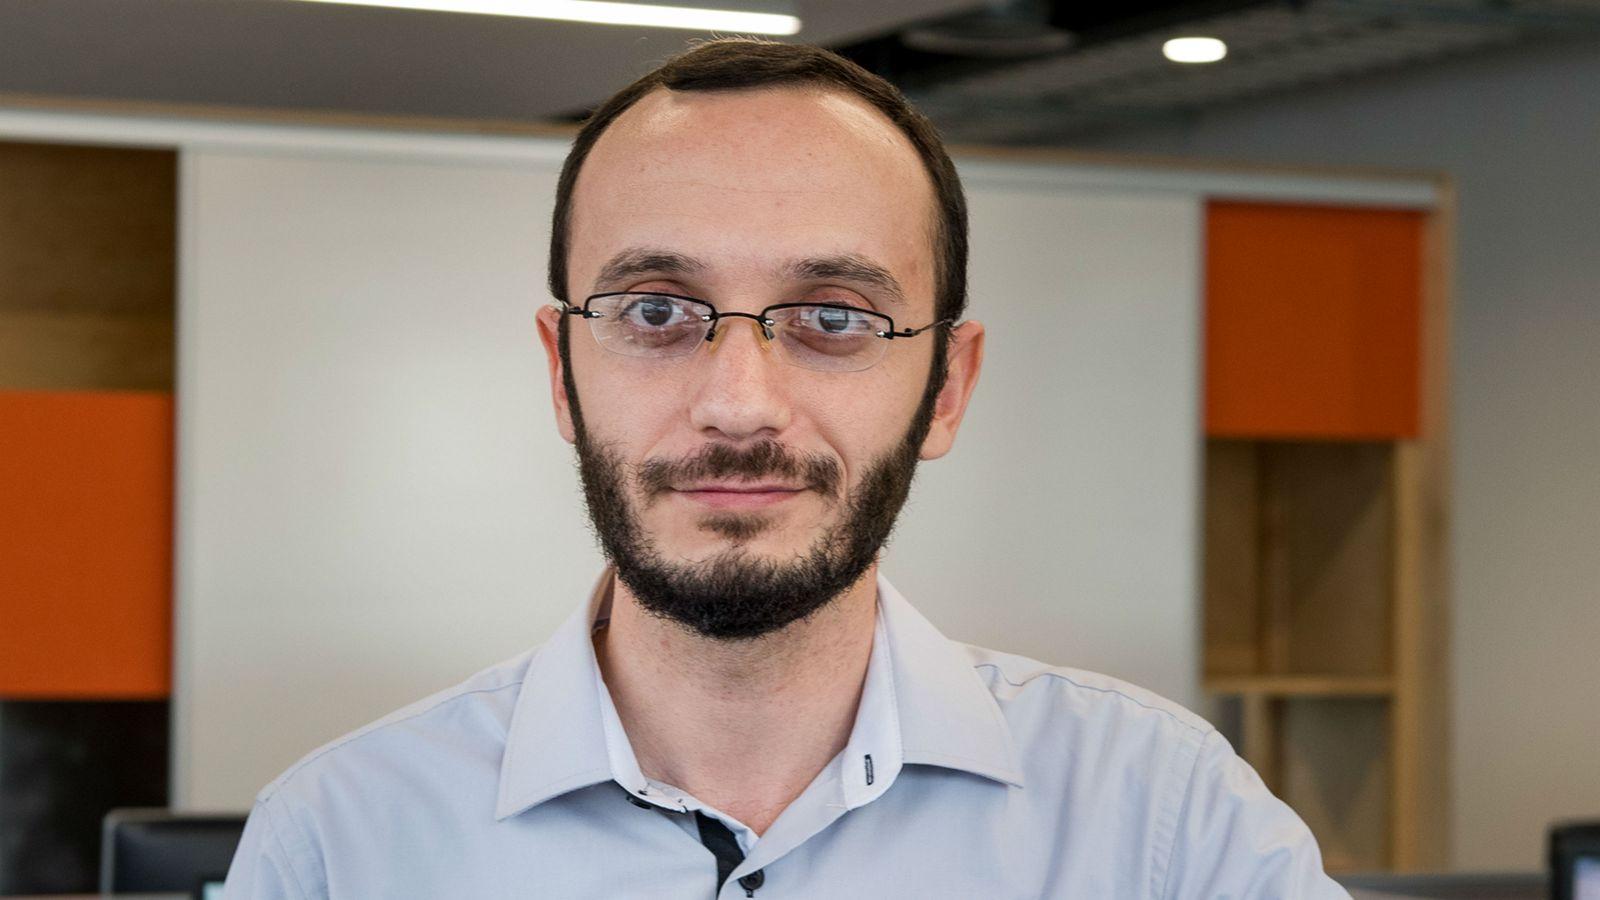 Omar Megdadi